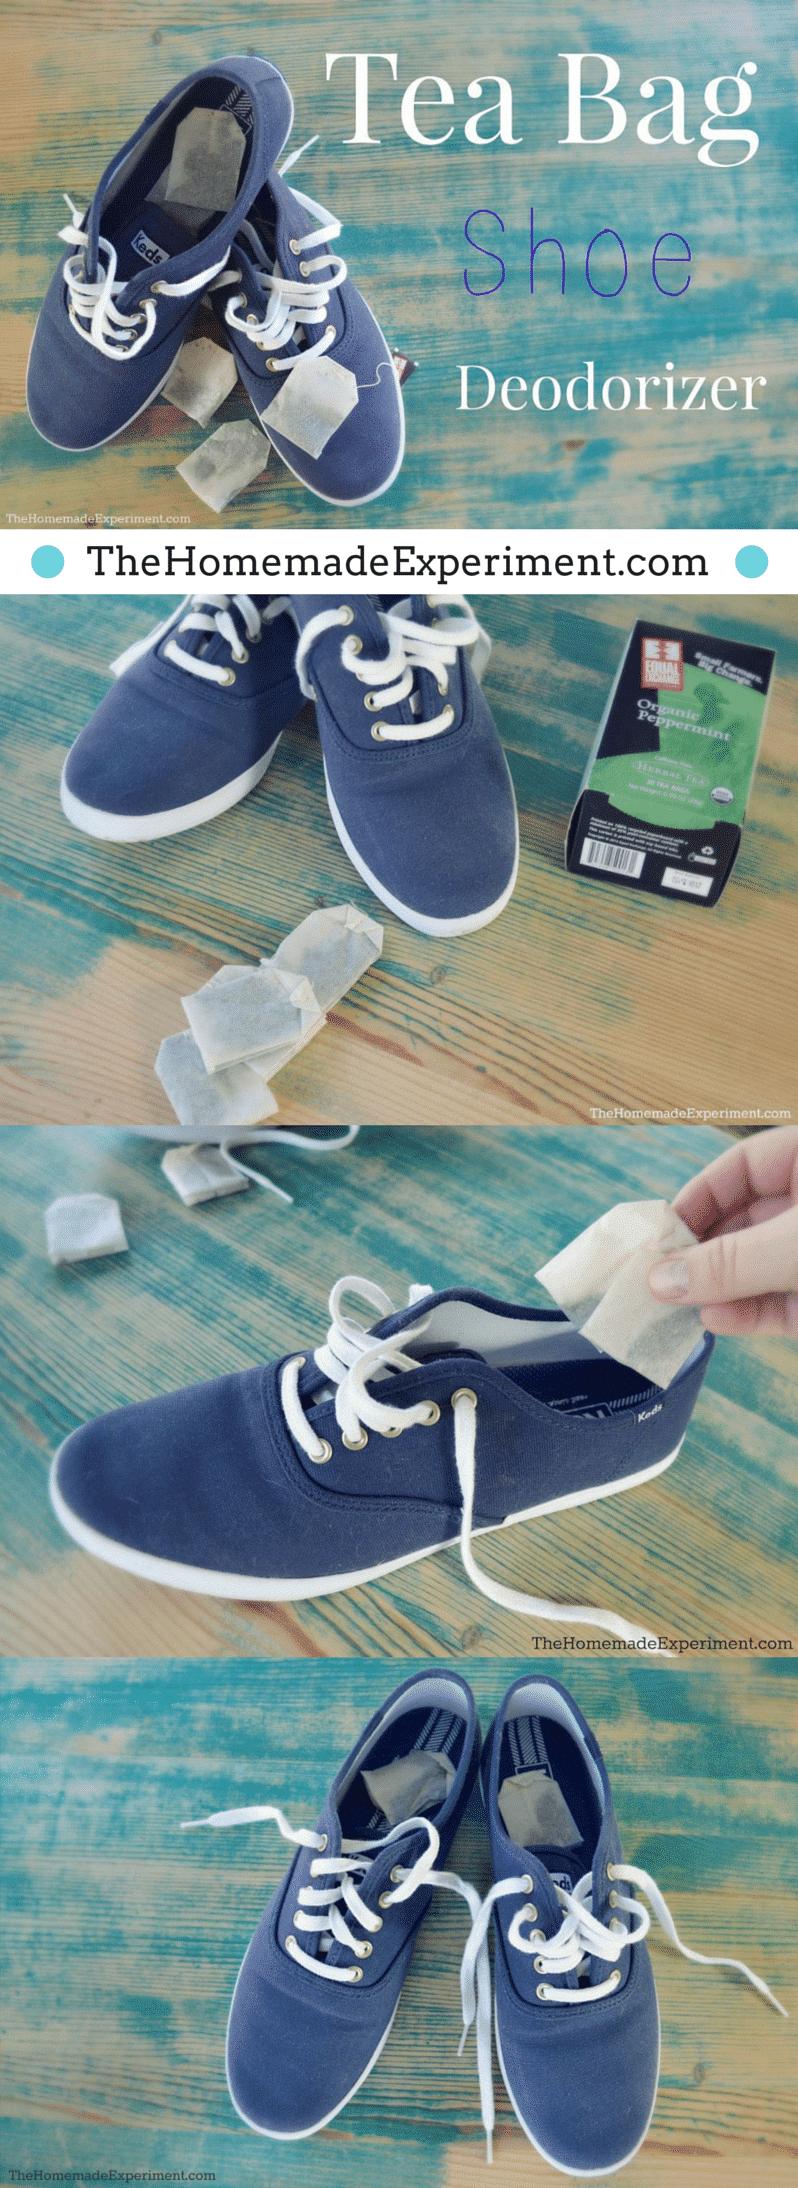 Homemade Shoe Deodorizer With Tea Bags